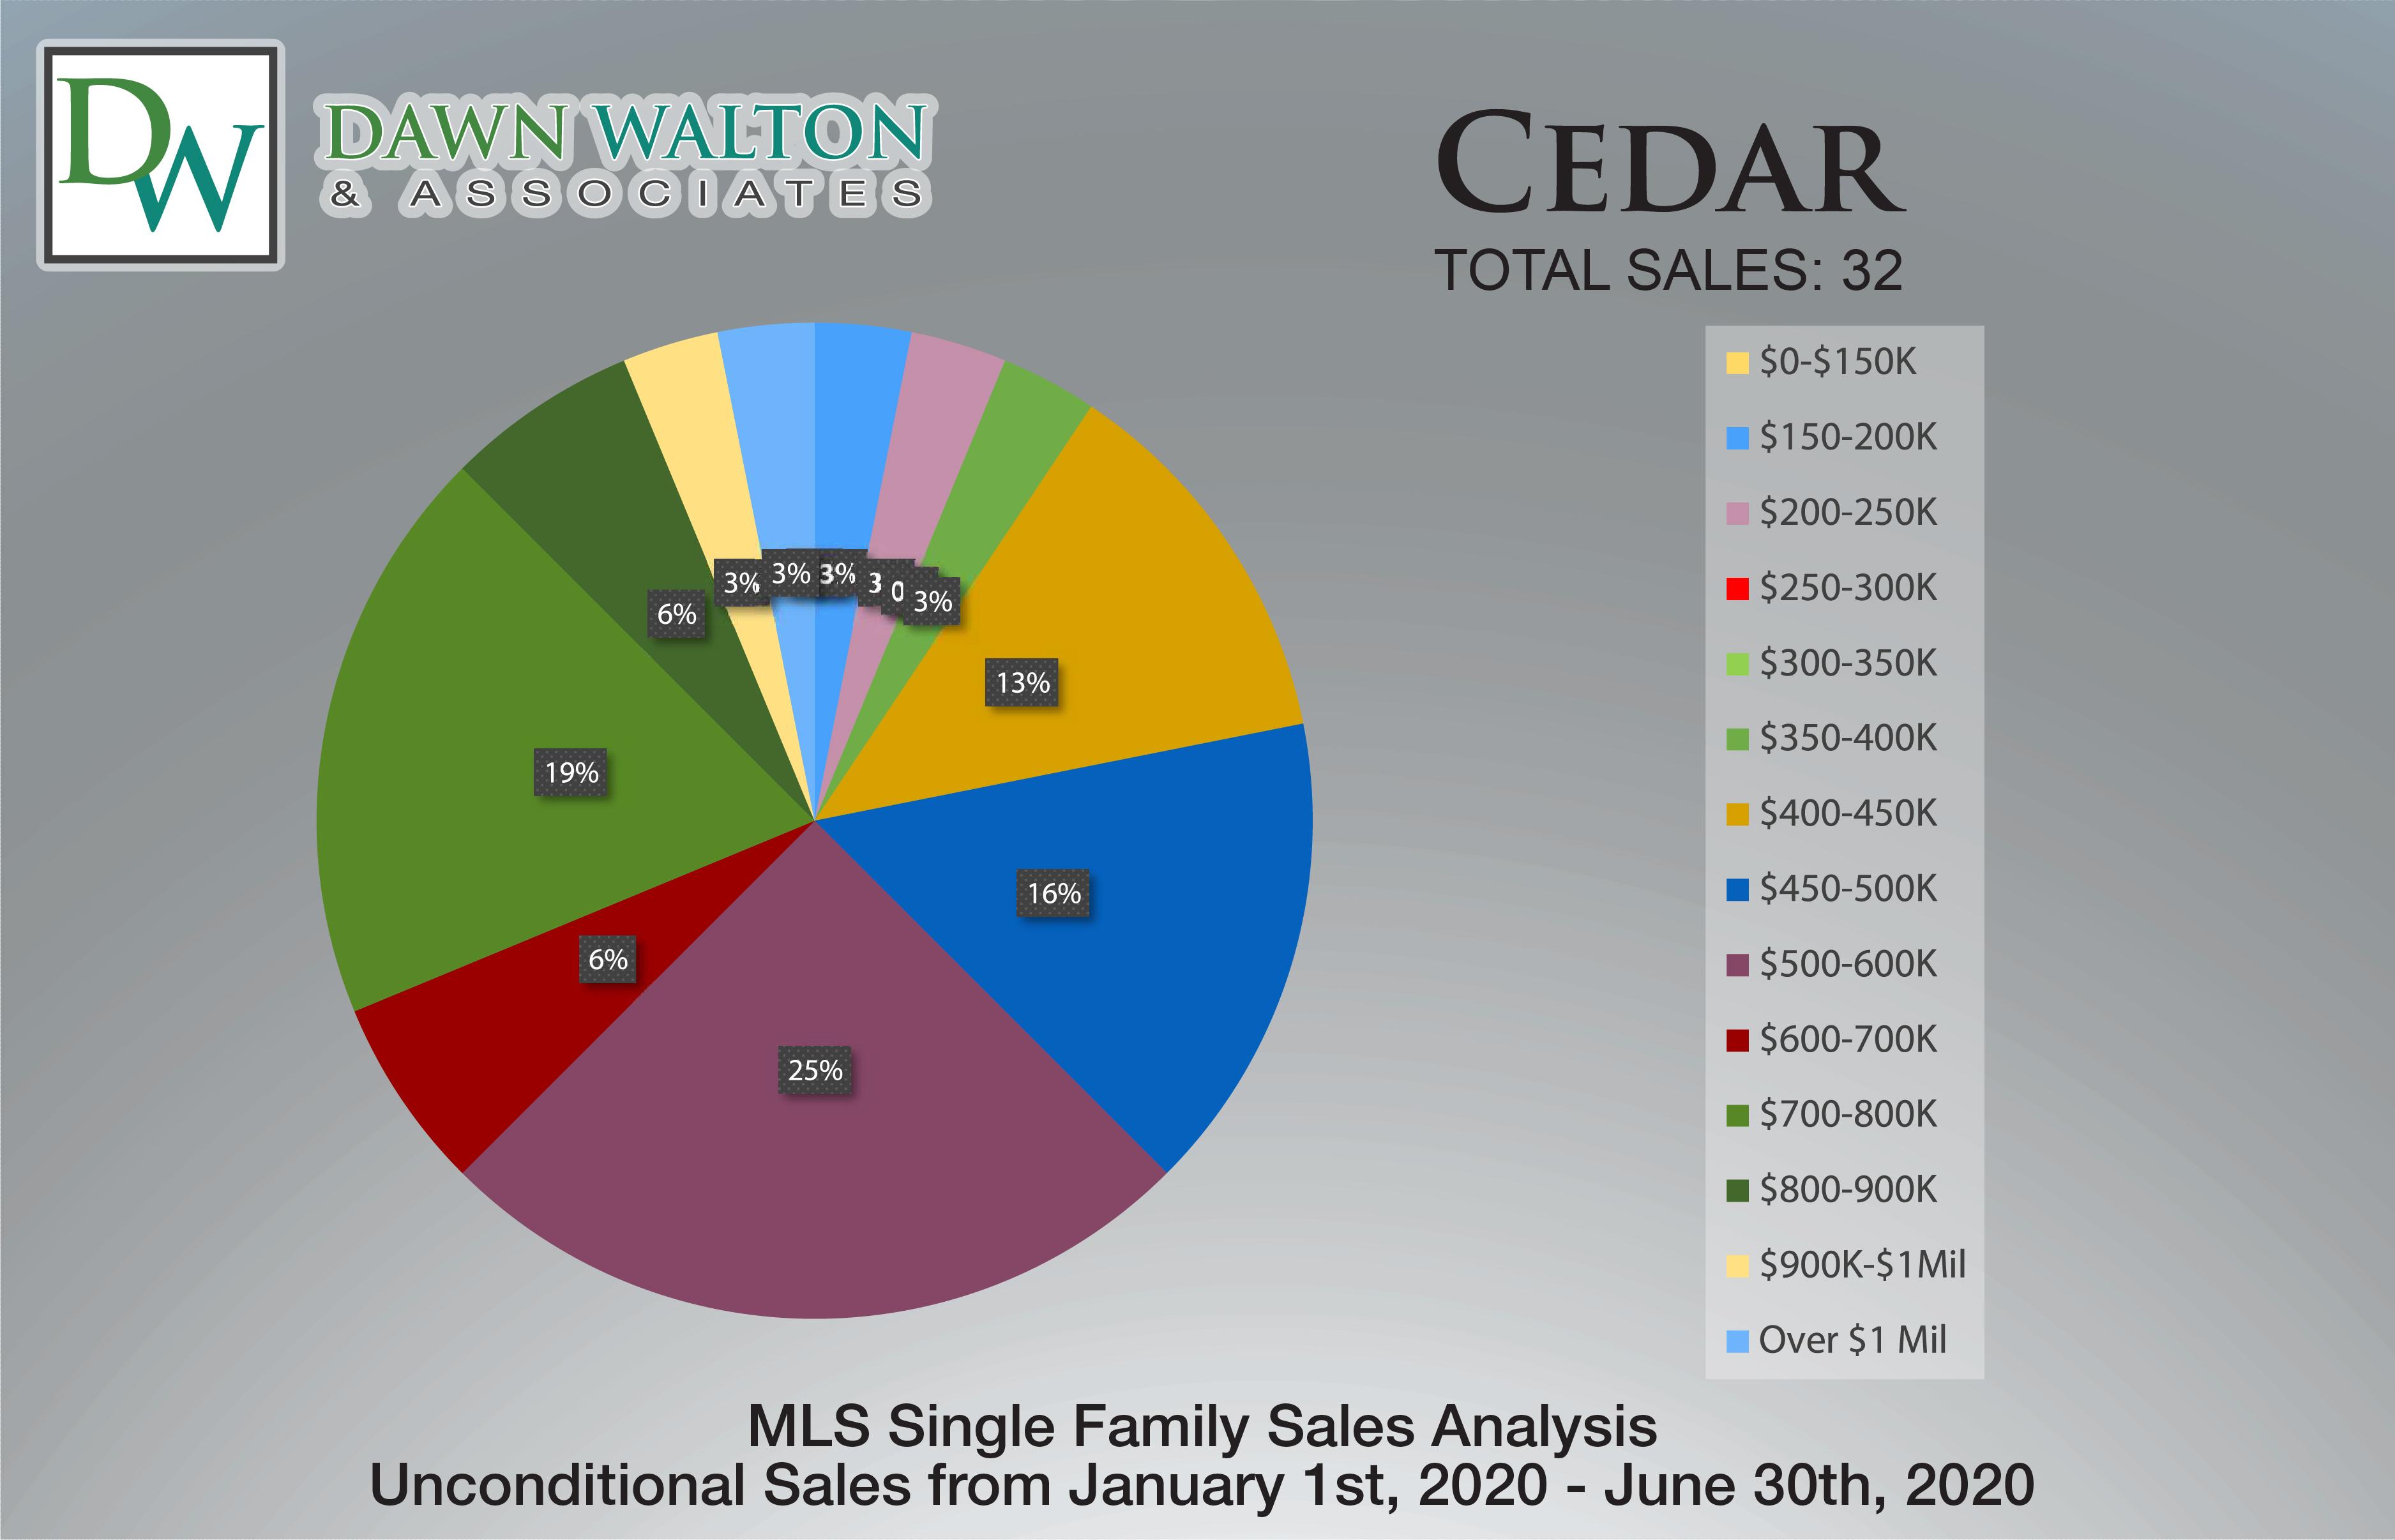 Cedar Real Estate Market Stats Price Percentage Jan 1- June 30th  2020 - Nanaimo Realtor Dawn Walton